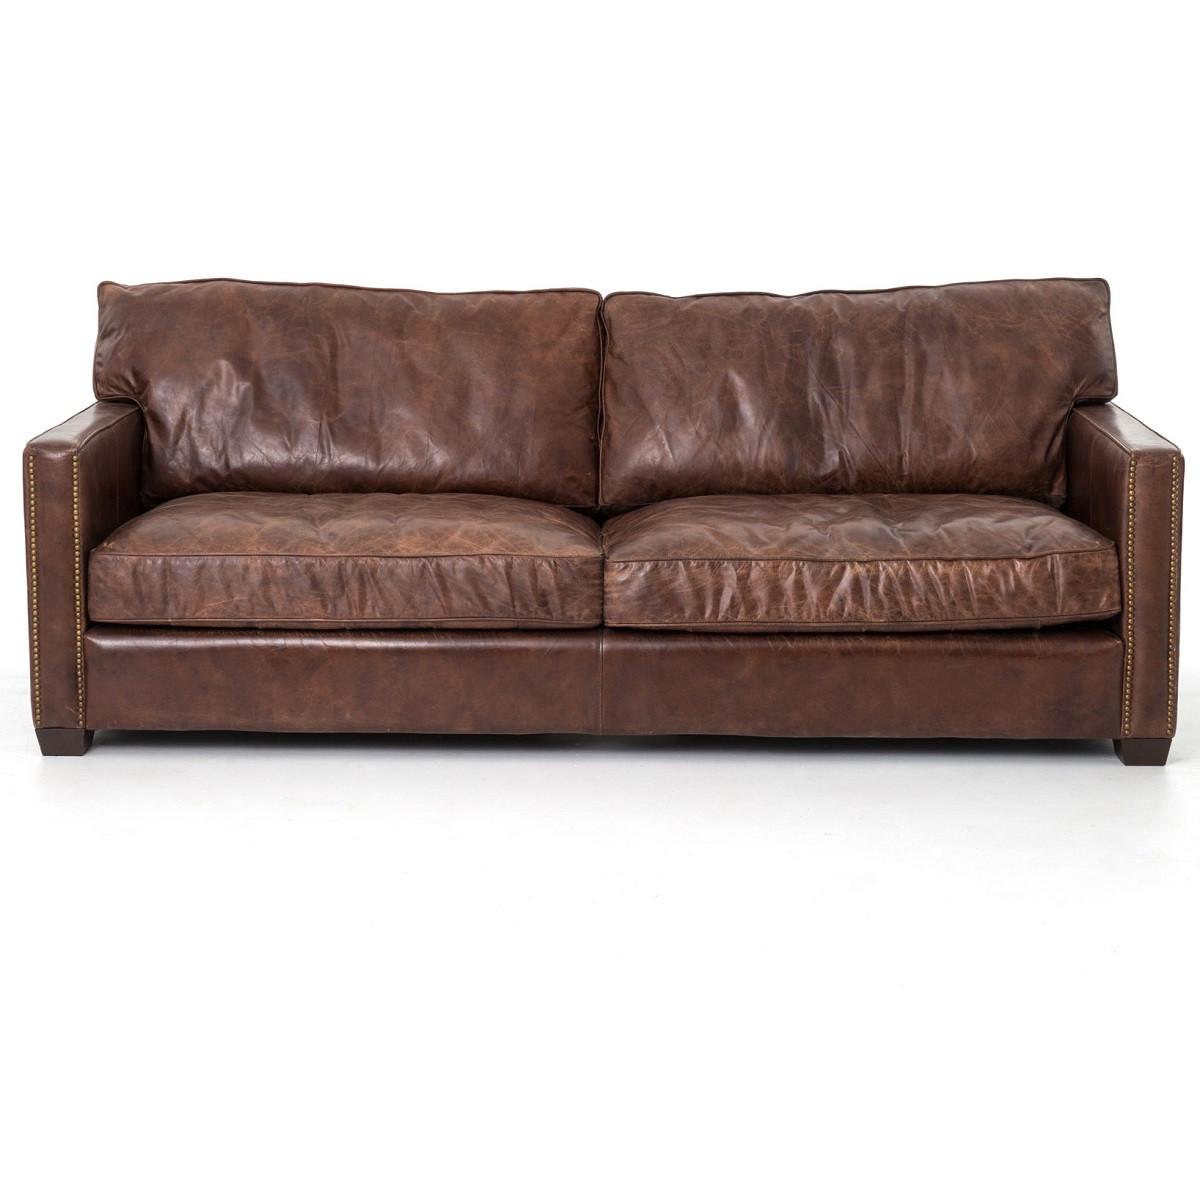 pee kensington leather sofa cheap grey rattan corner cigar odelia vintage sofas